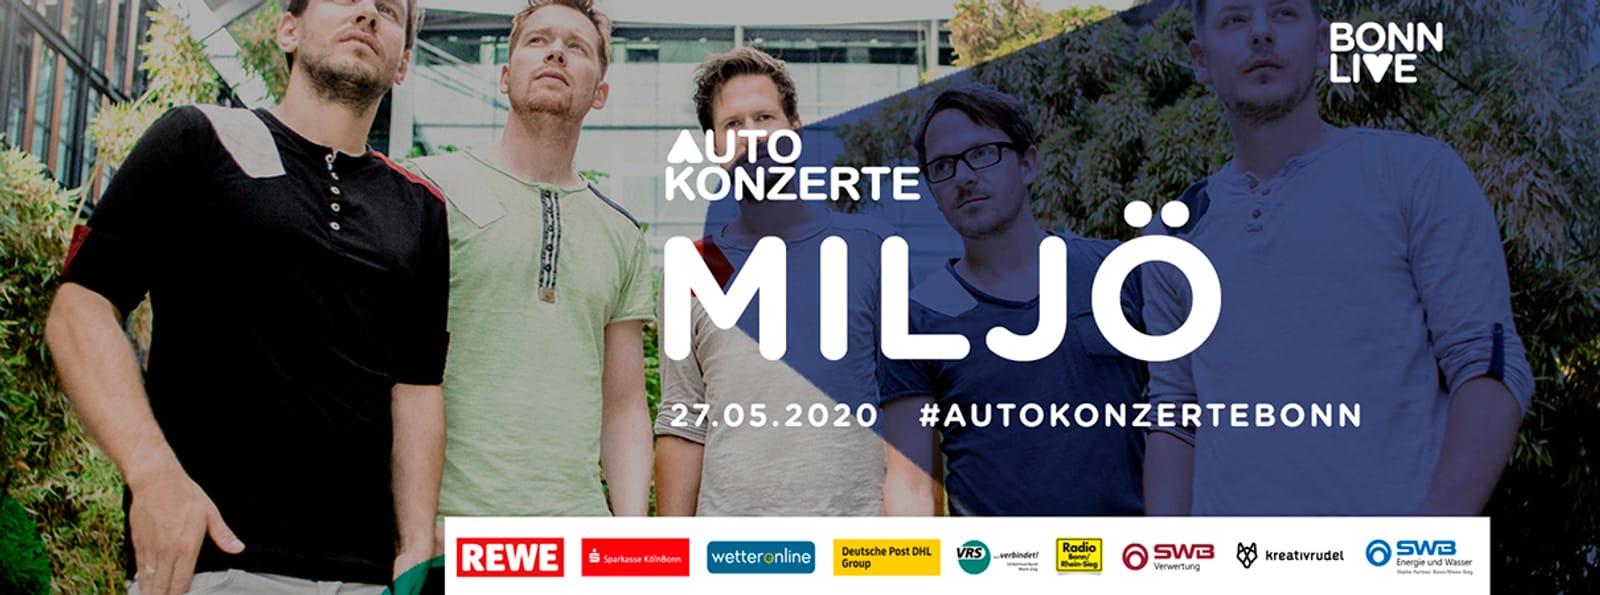 Miljö   BonnLive Autokonzerte   Zusatzshow